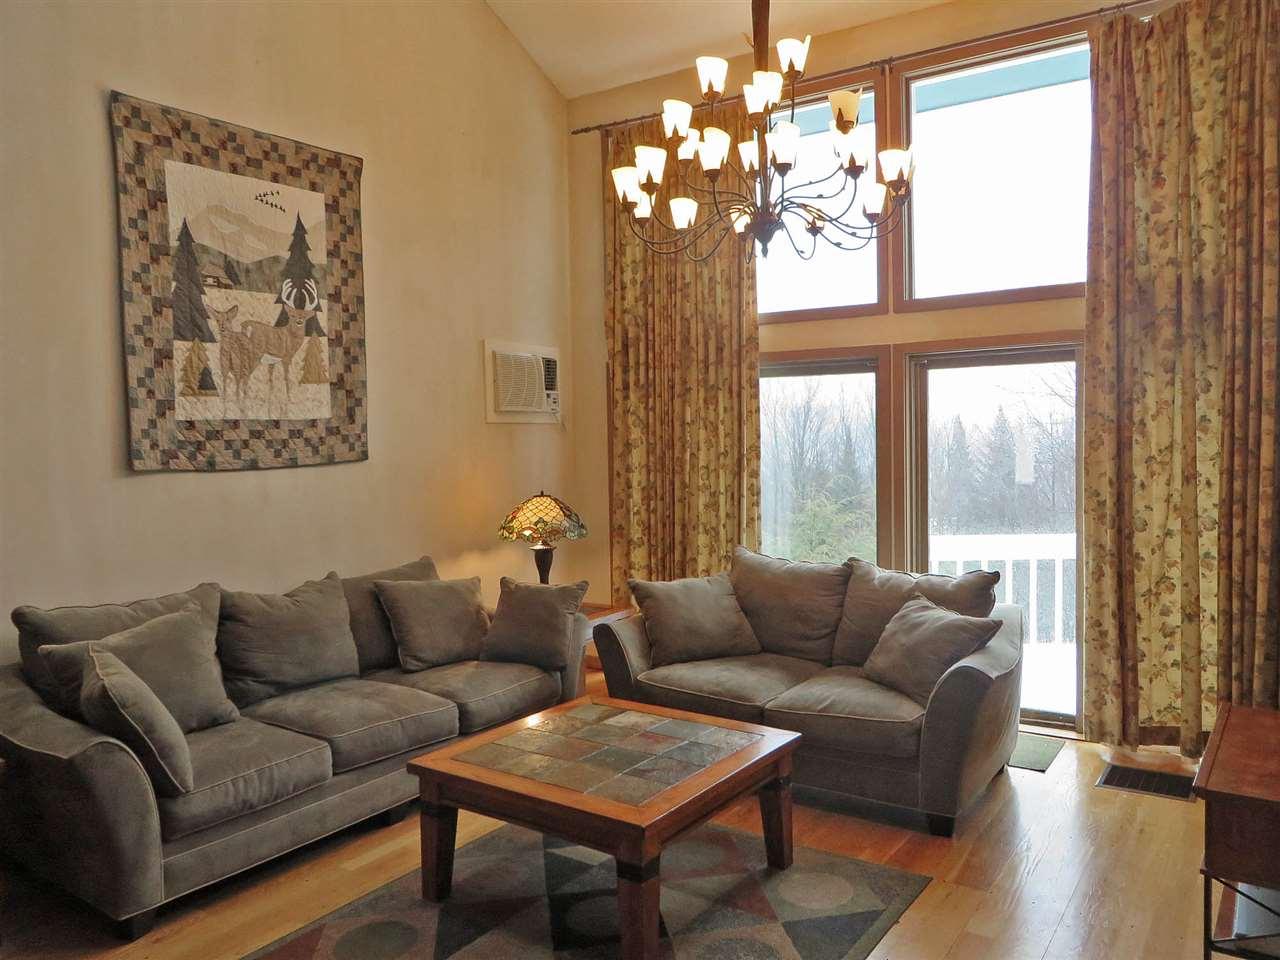 Mount-Snow-Real-Estate-4472536-13